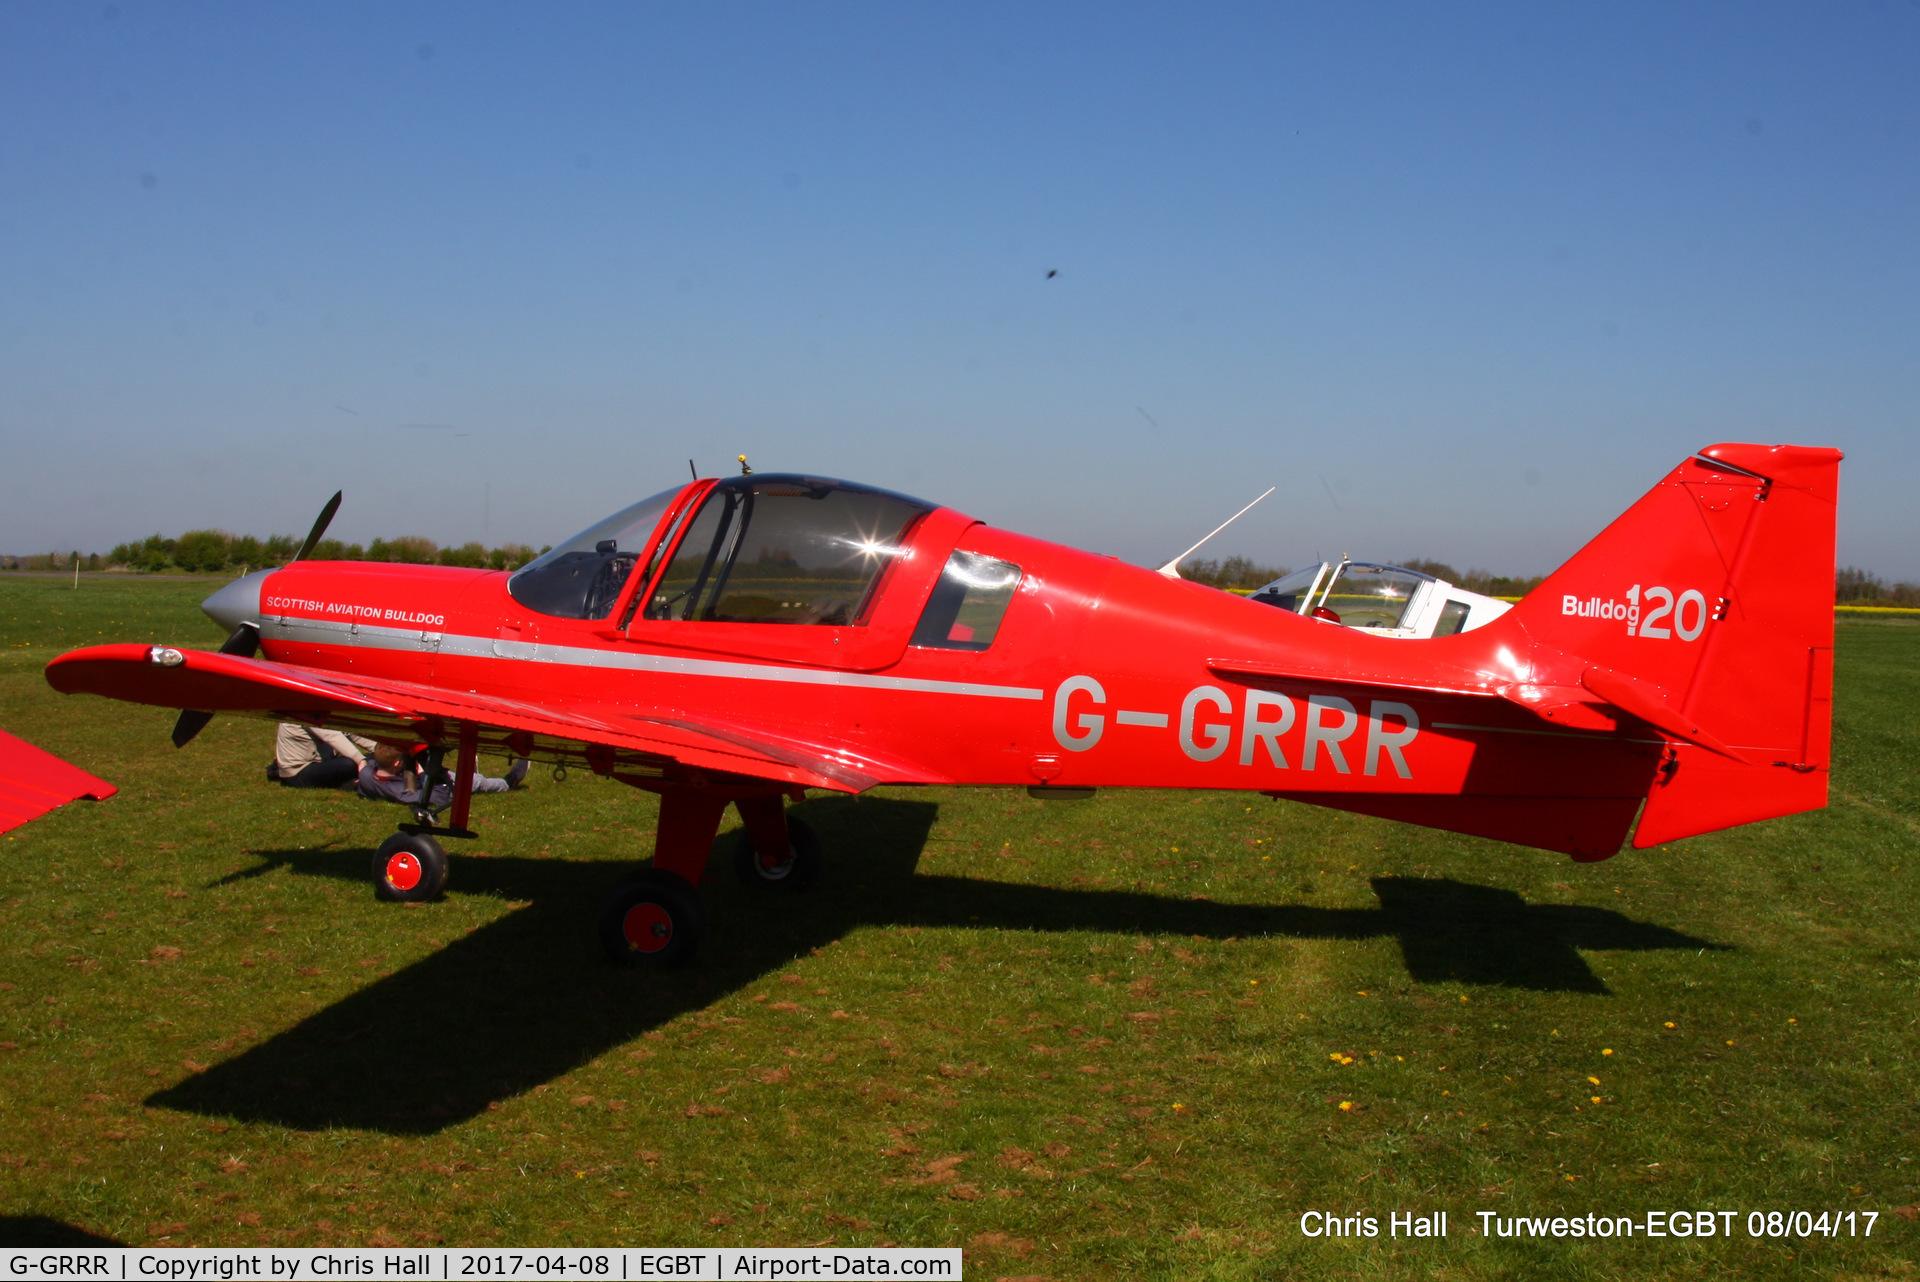 G-GRRR, 1973 Scottish Aviation Bulldog Series 120 Model 122 C/N BH120/229, at The Beagle Pup 50th anniversary celebration fly in